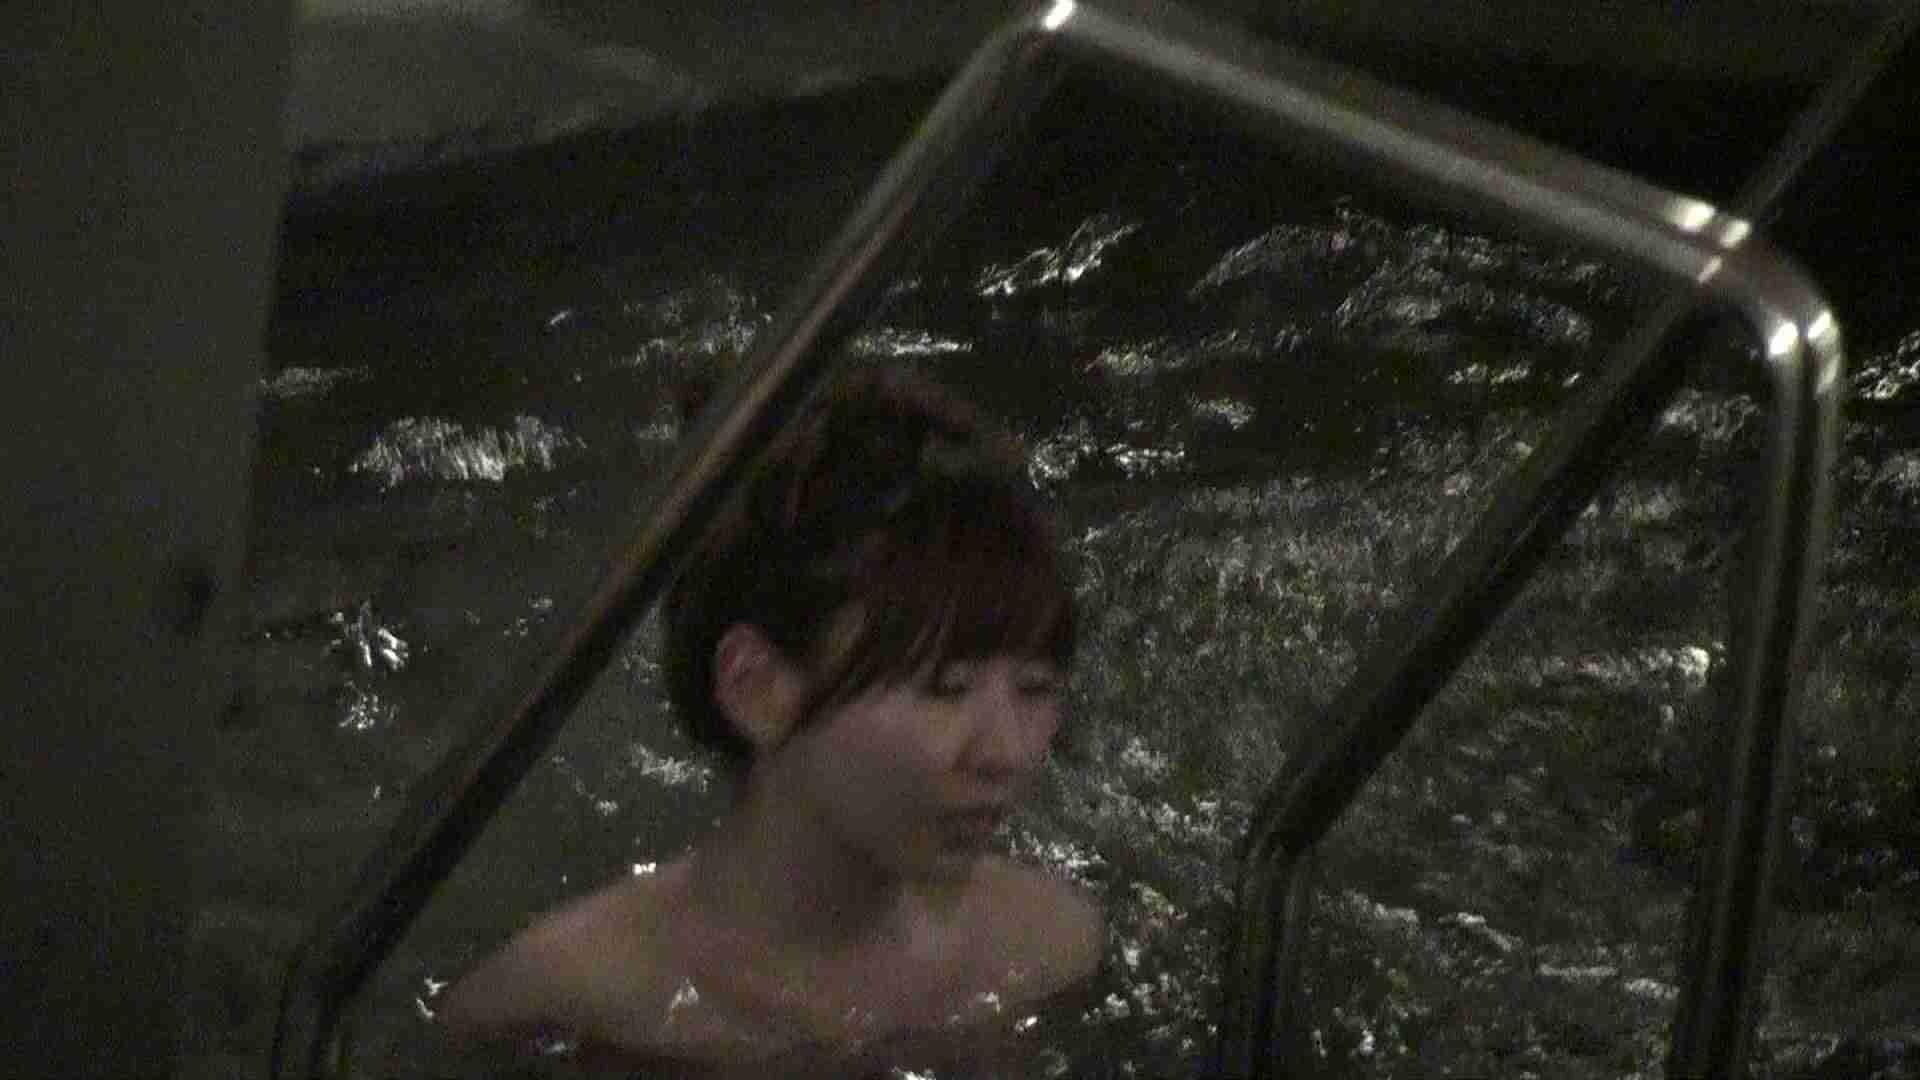 Aquaな露天風呂Vol.410 盗撮  73連発 60